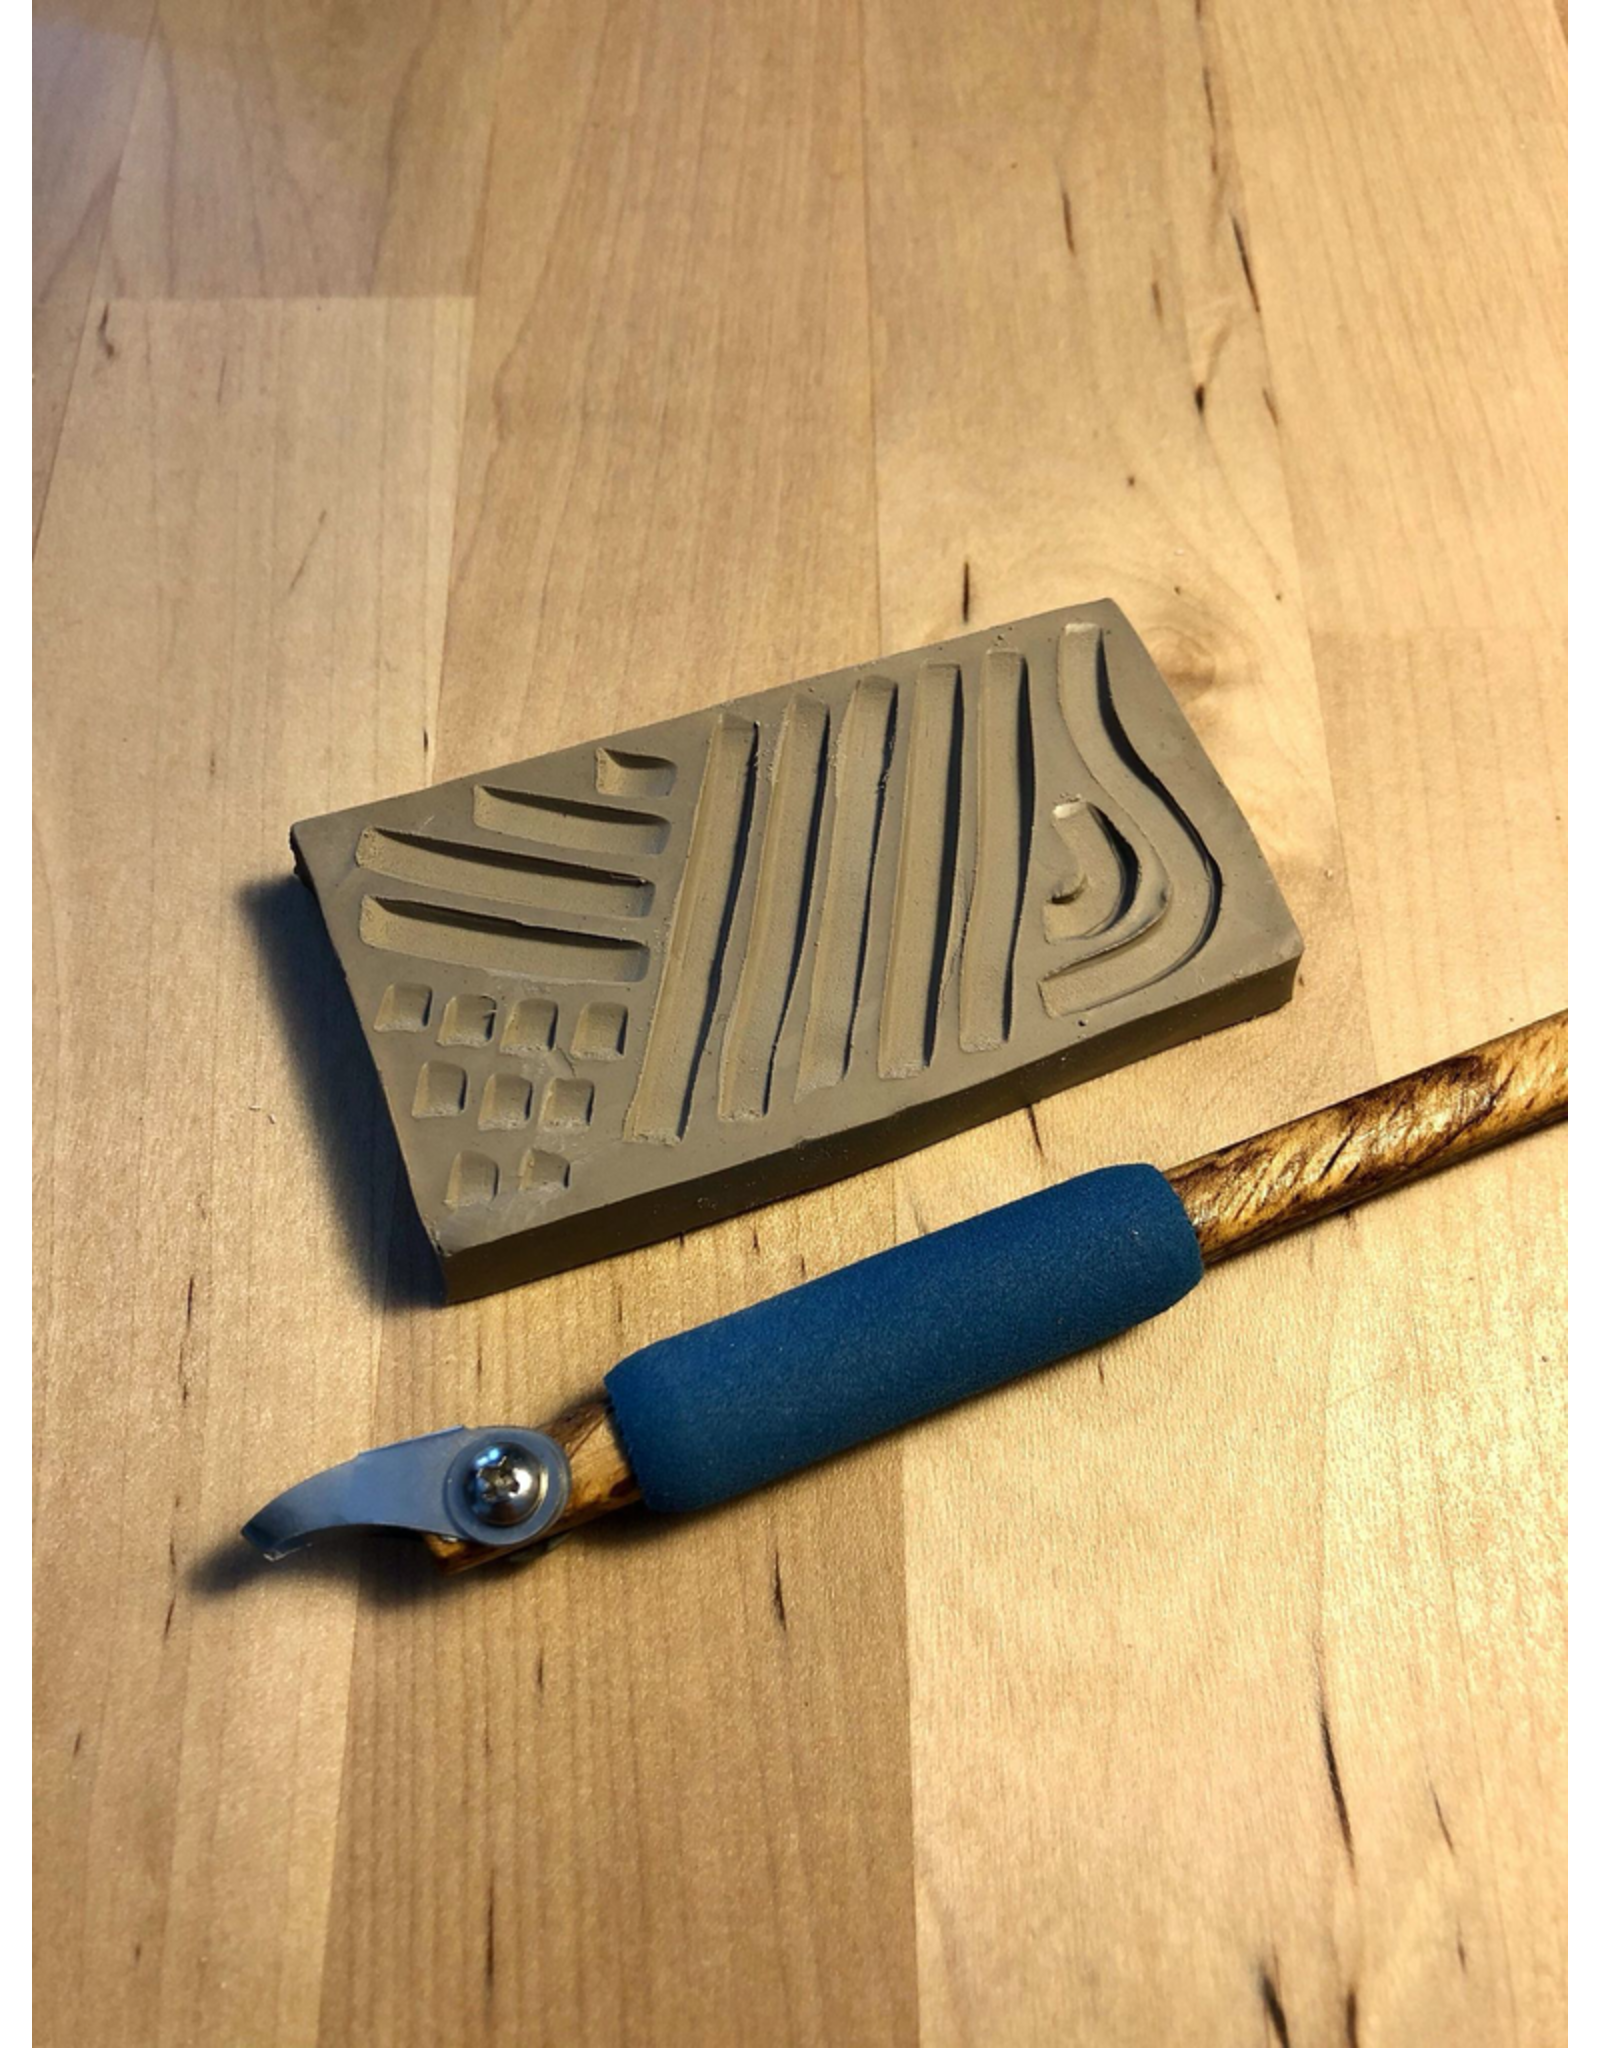 Diamondcore Tools Curved Square Tip 3mm (P15) Pencil carver